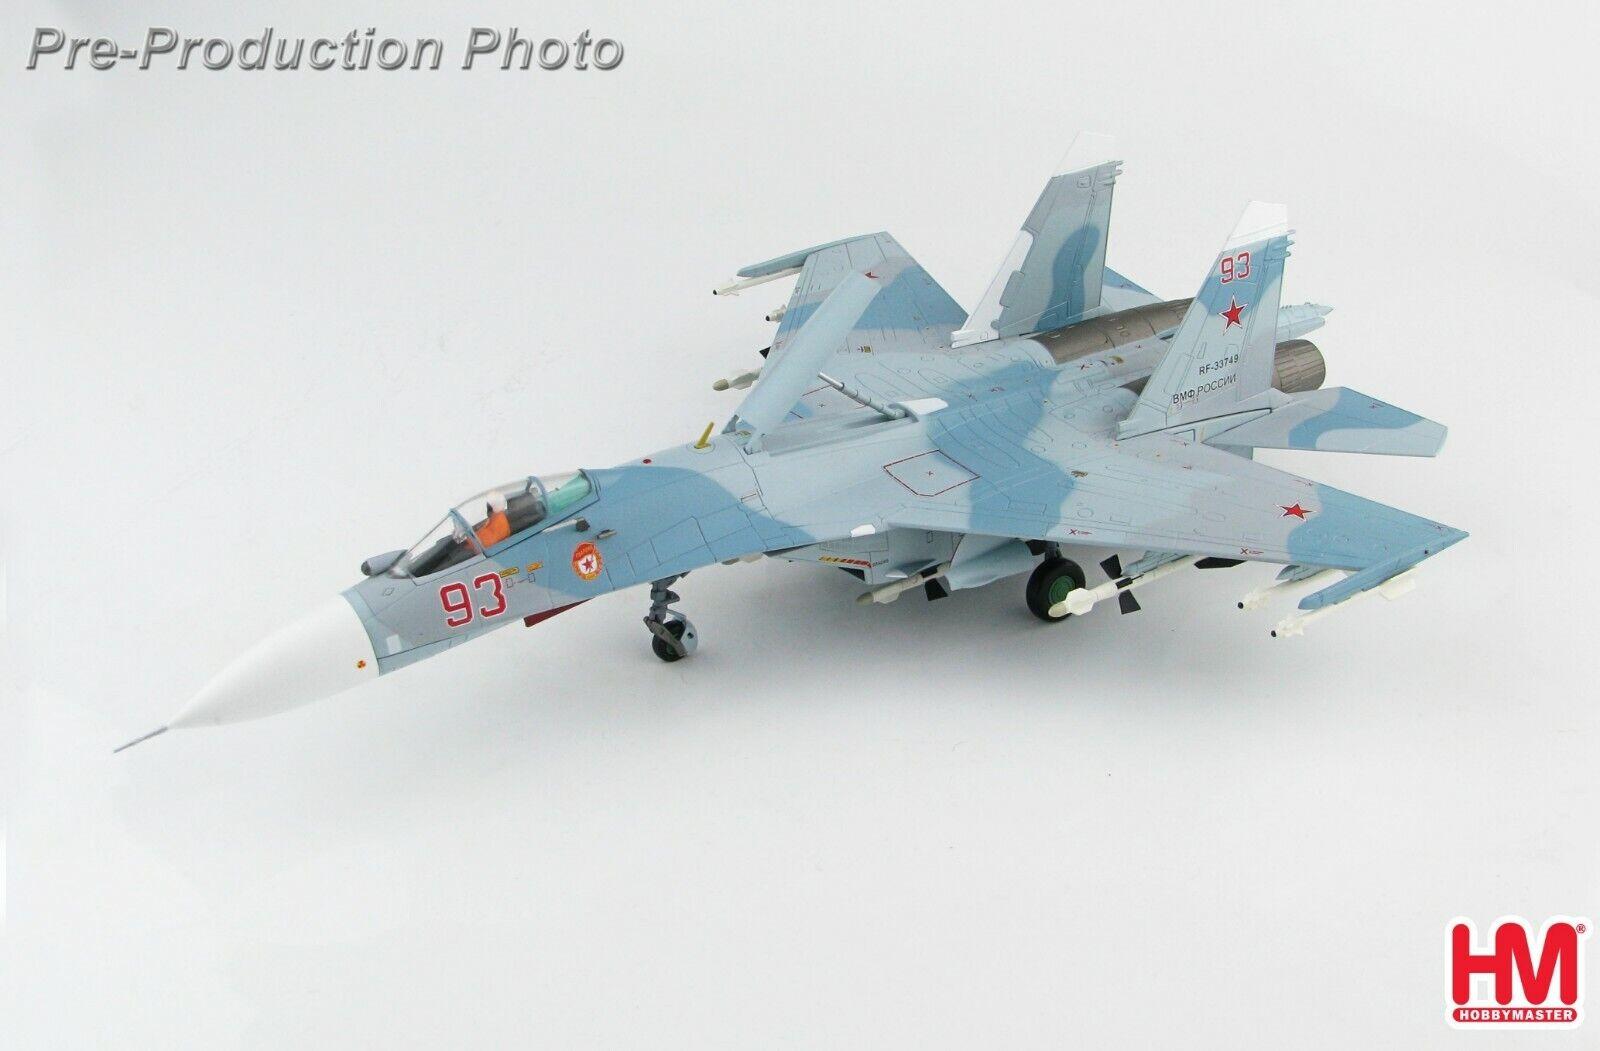 Sukhoi Su-27 Flanker-B  rouge 93 Baltic Fleet Russian Navy 2017 Hobbymaster HA6006  produits créatifs